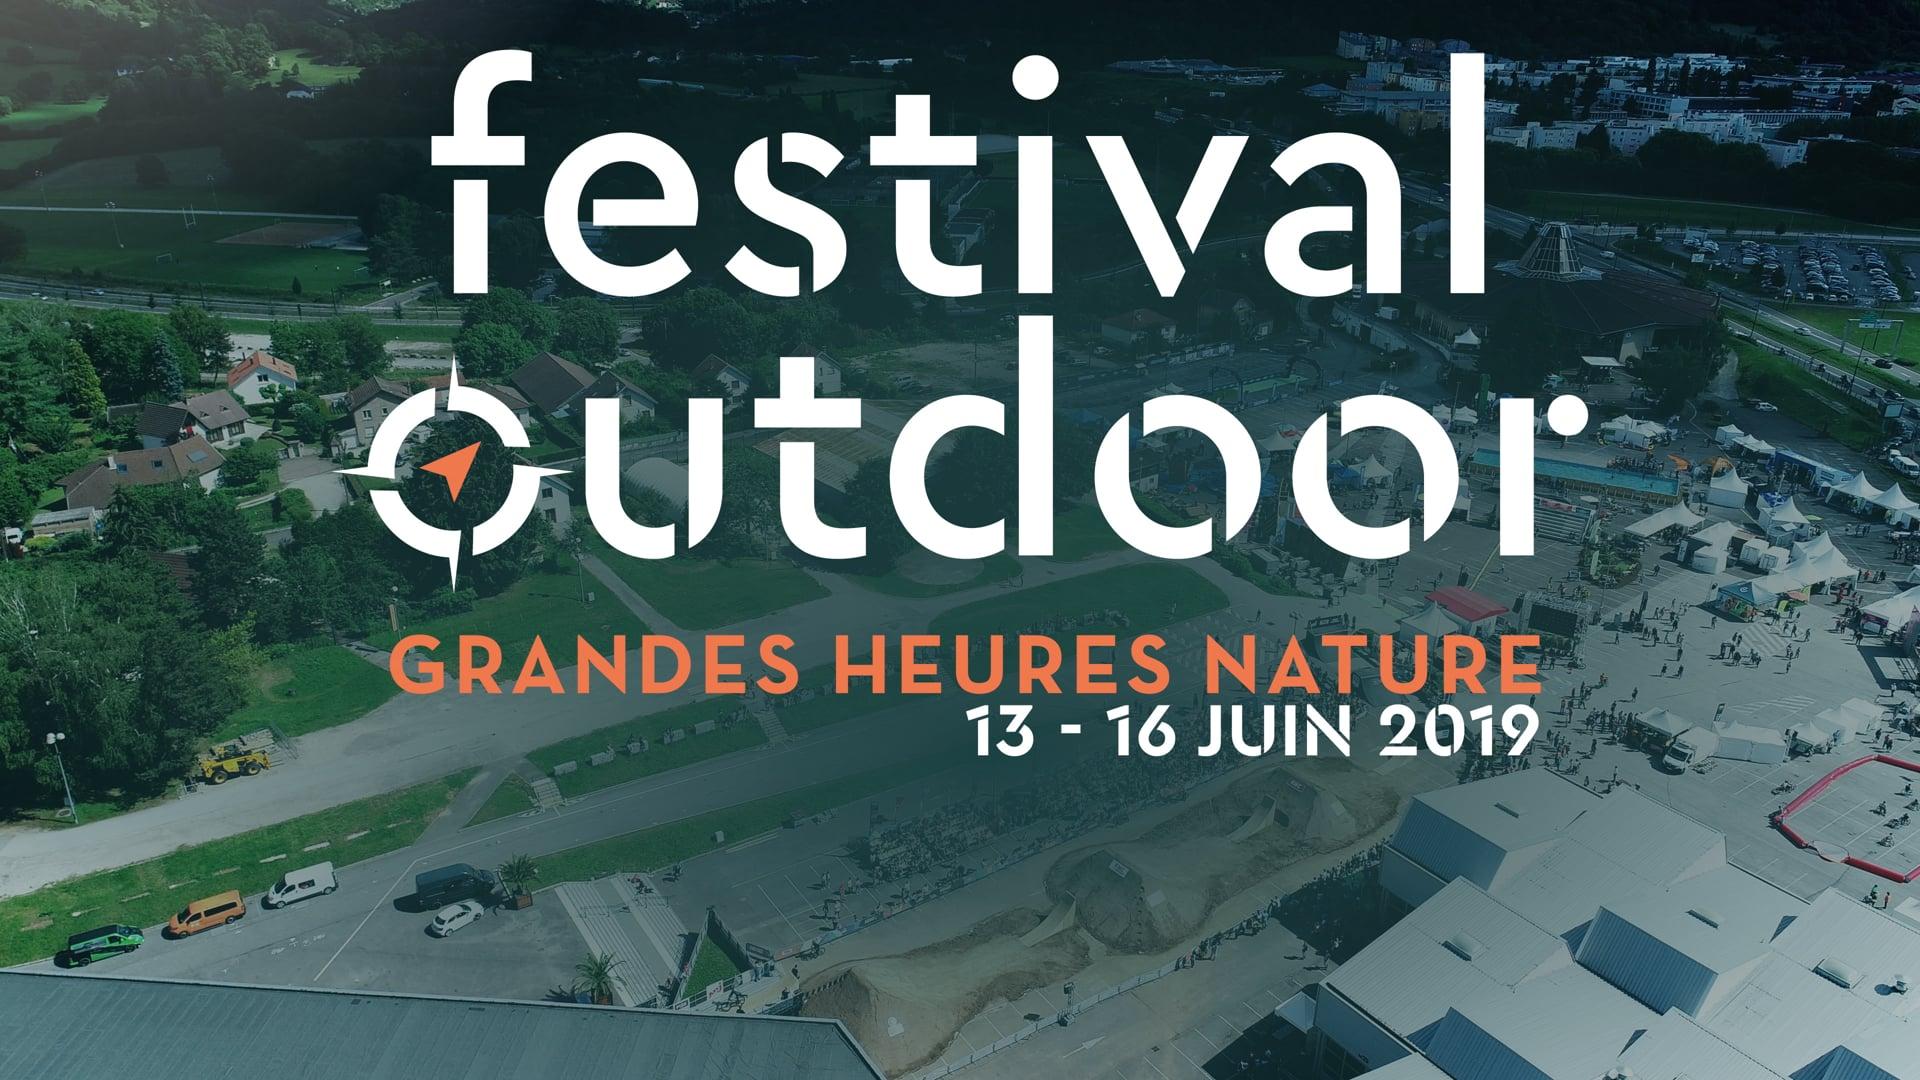 Festival Grandes Heures Nature 2019